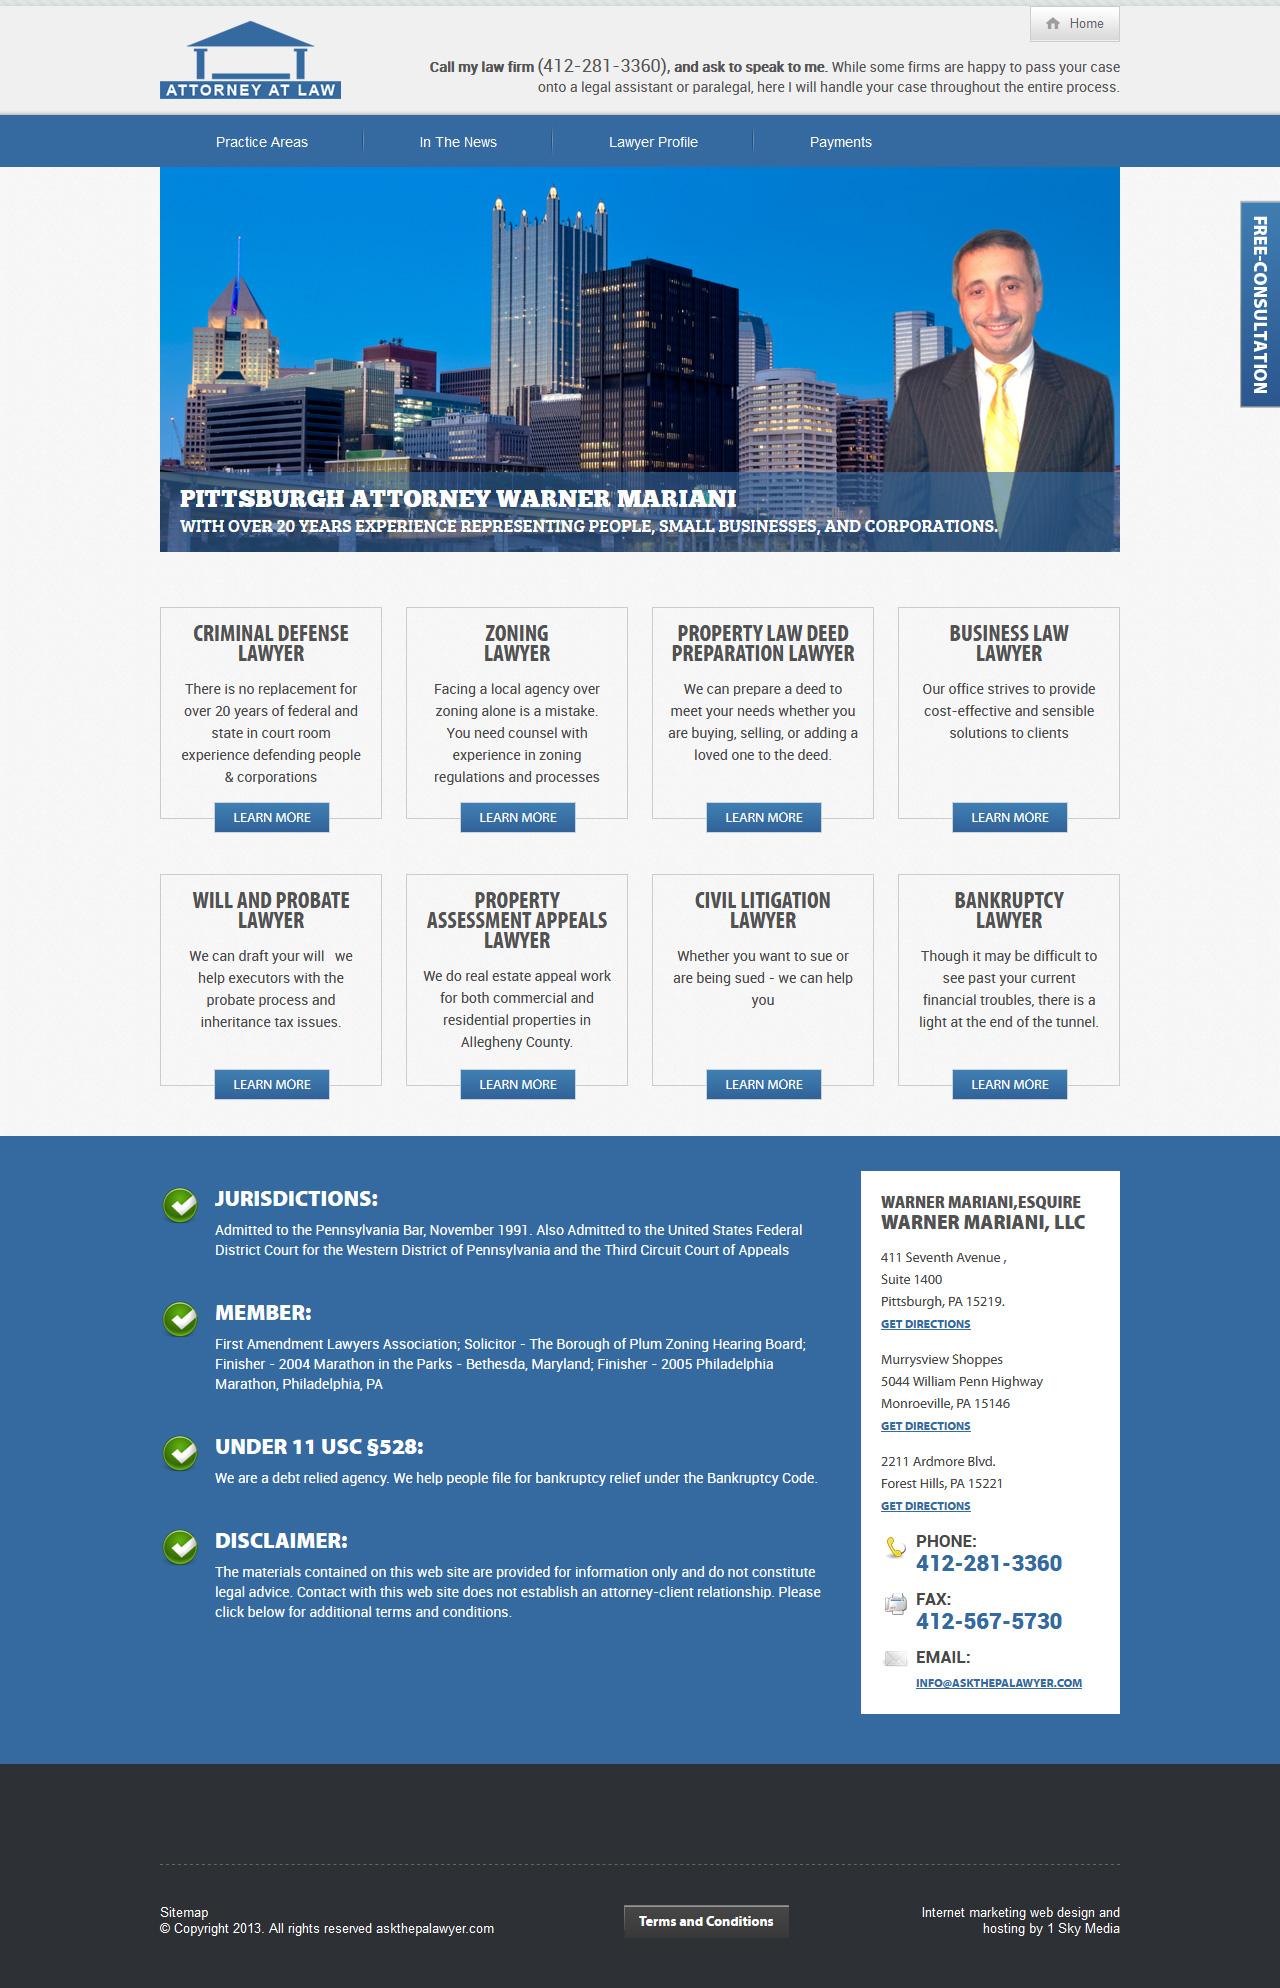 AskThePALawyer.com attorney website design